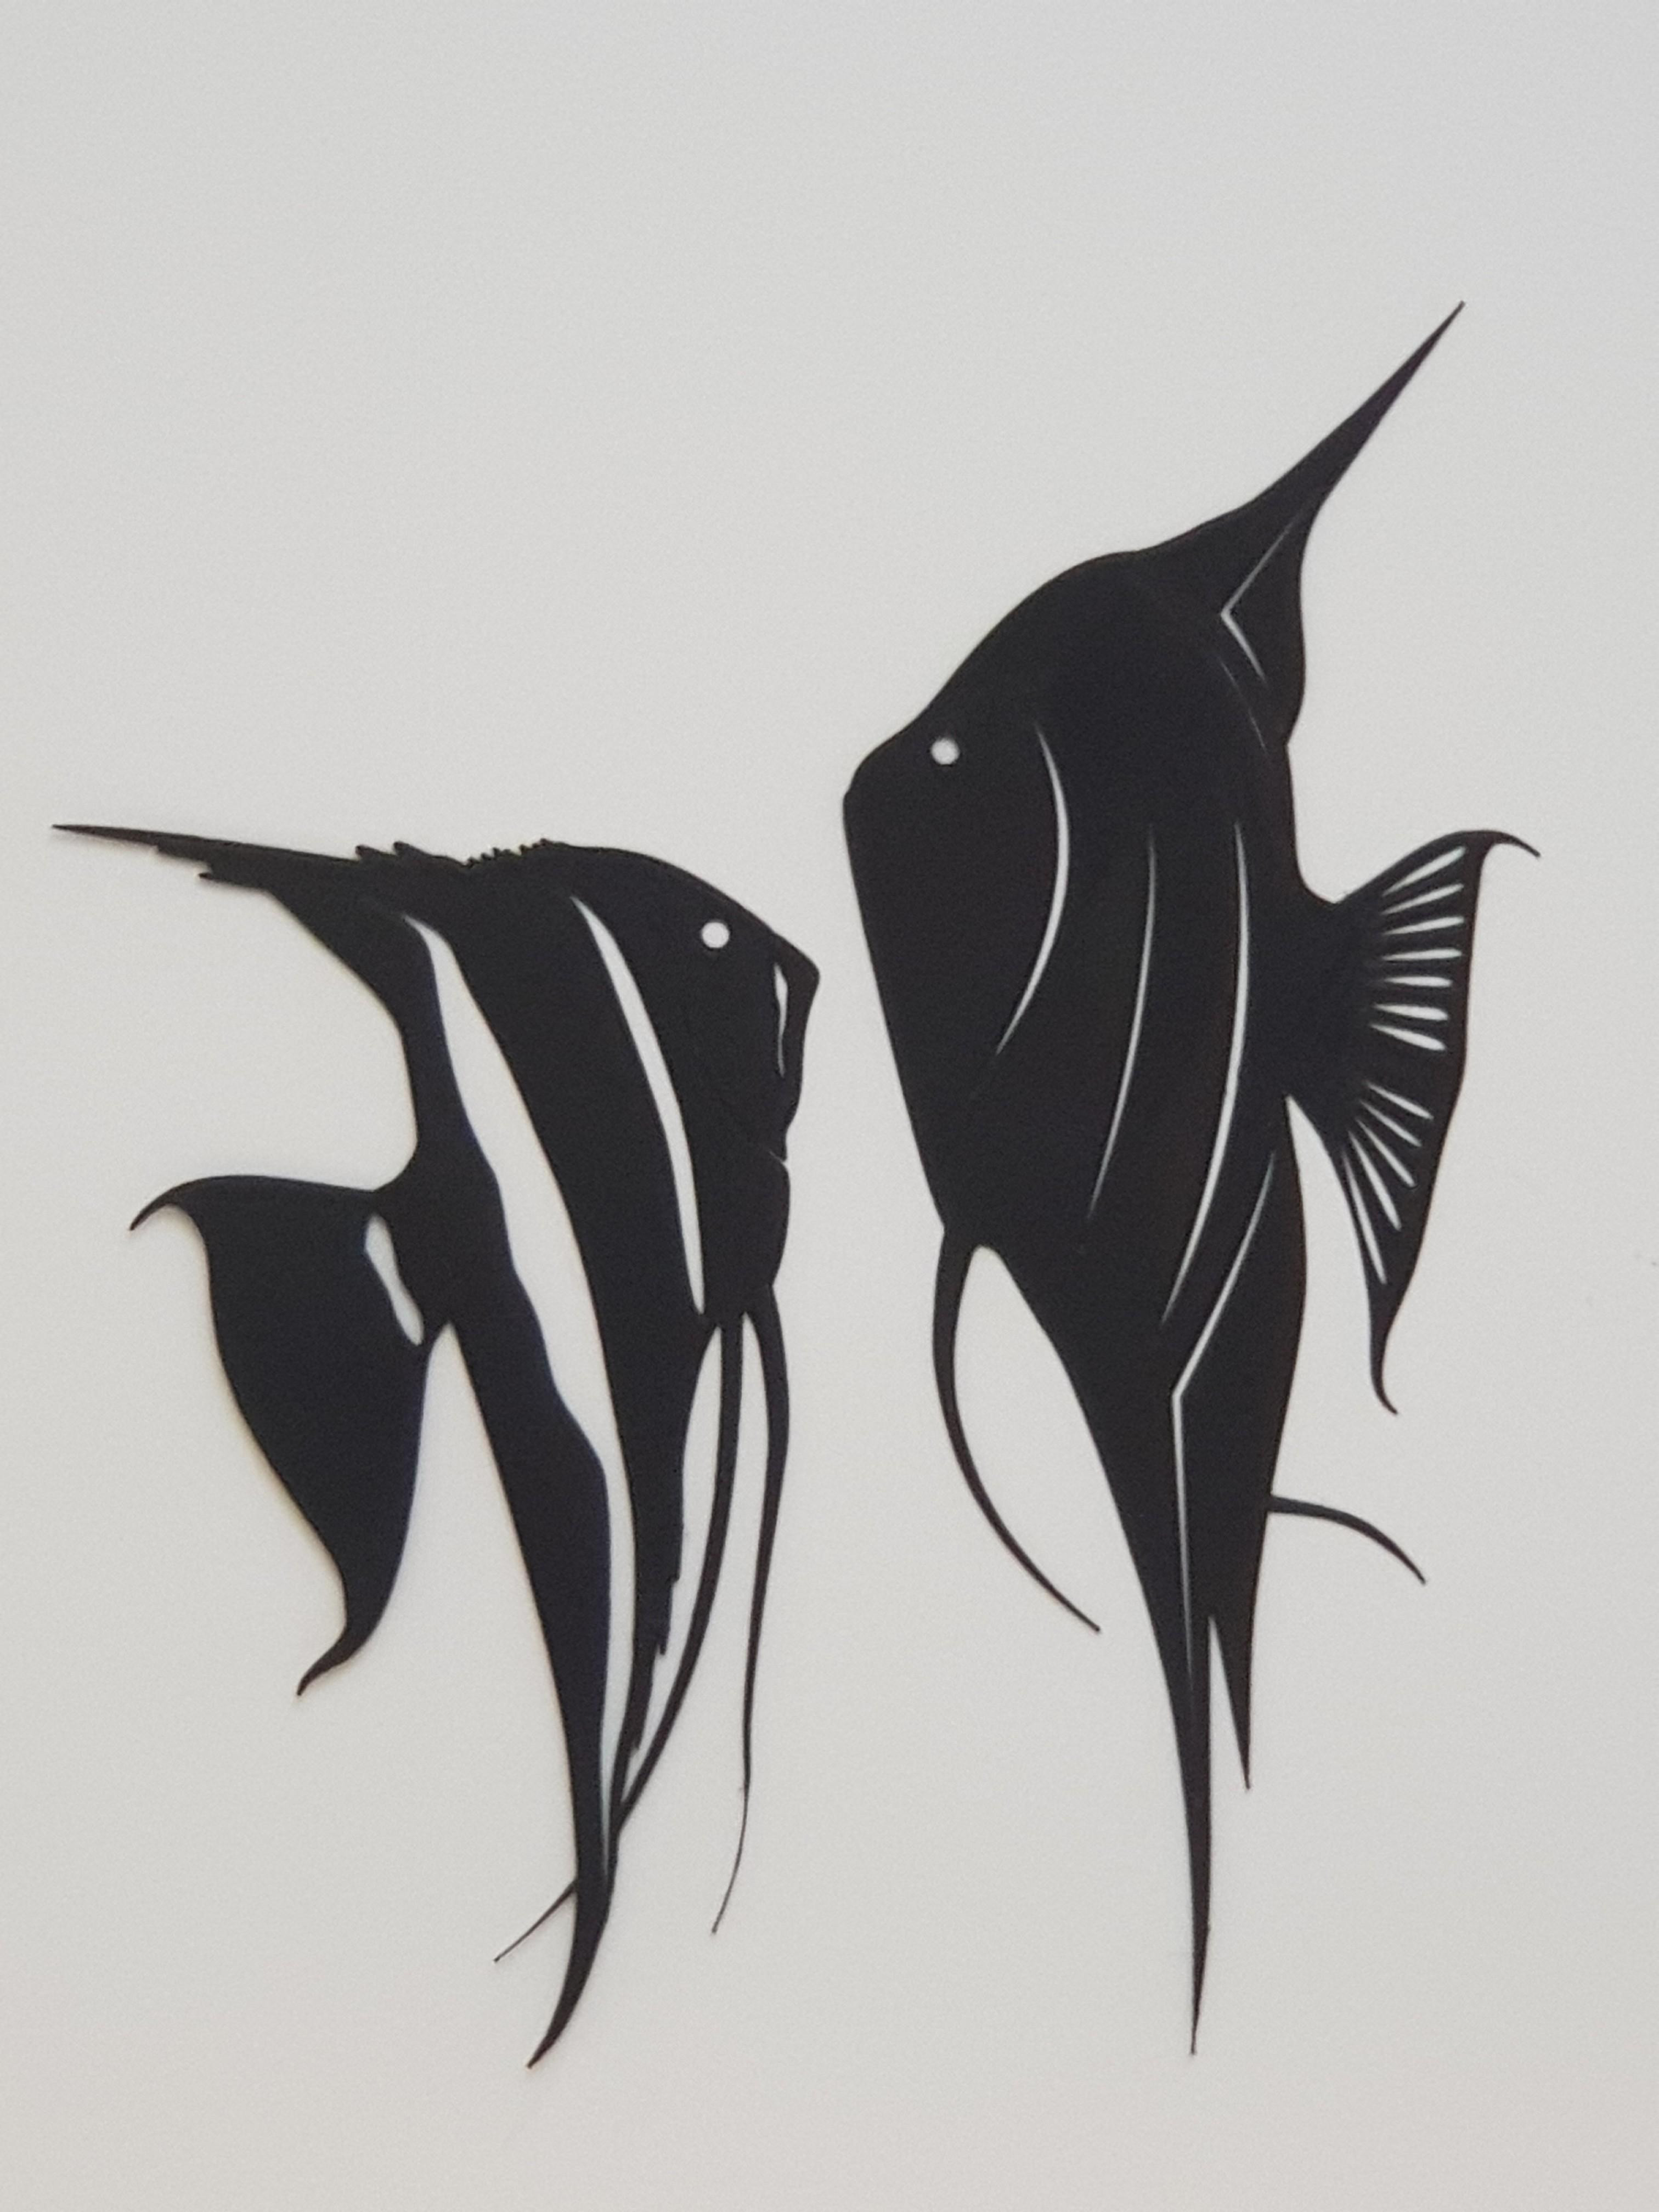 20180904_182555.jpg Download STL file Angel fish wall art \ Decor • 3D printing object, 3dprintlines